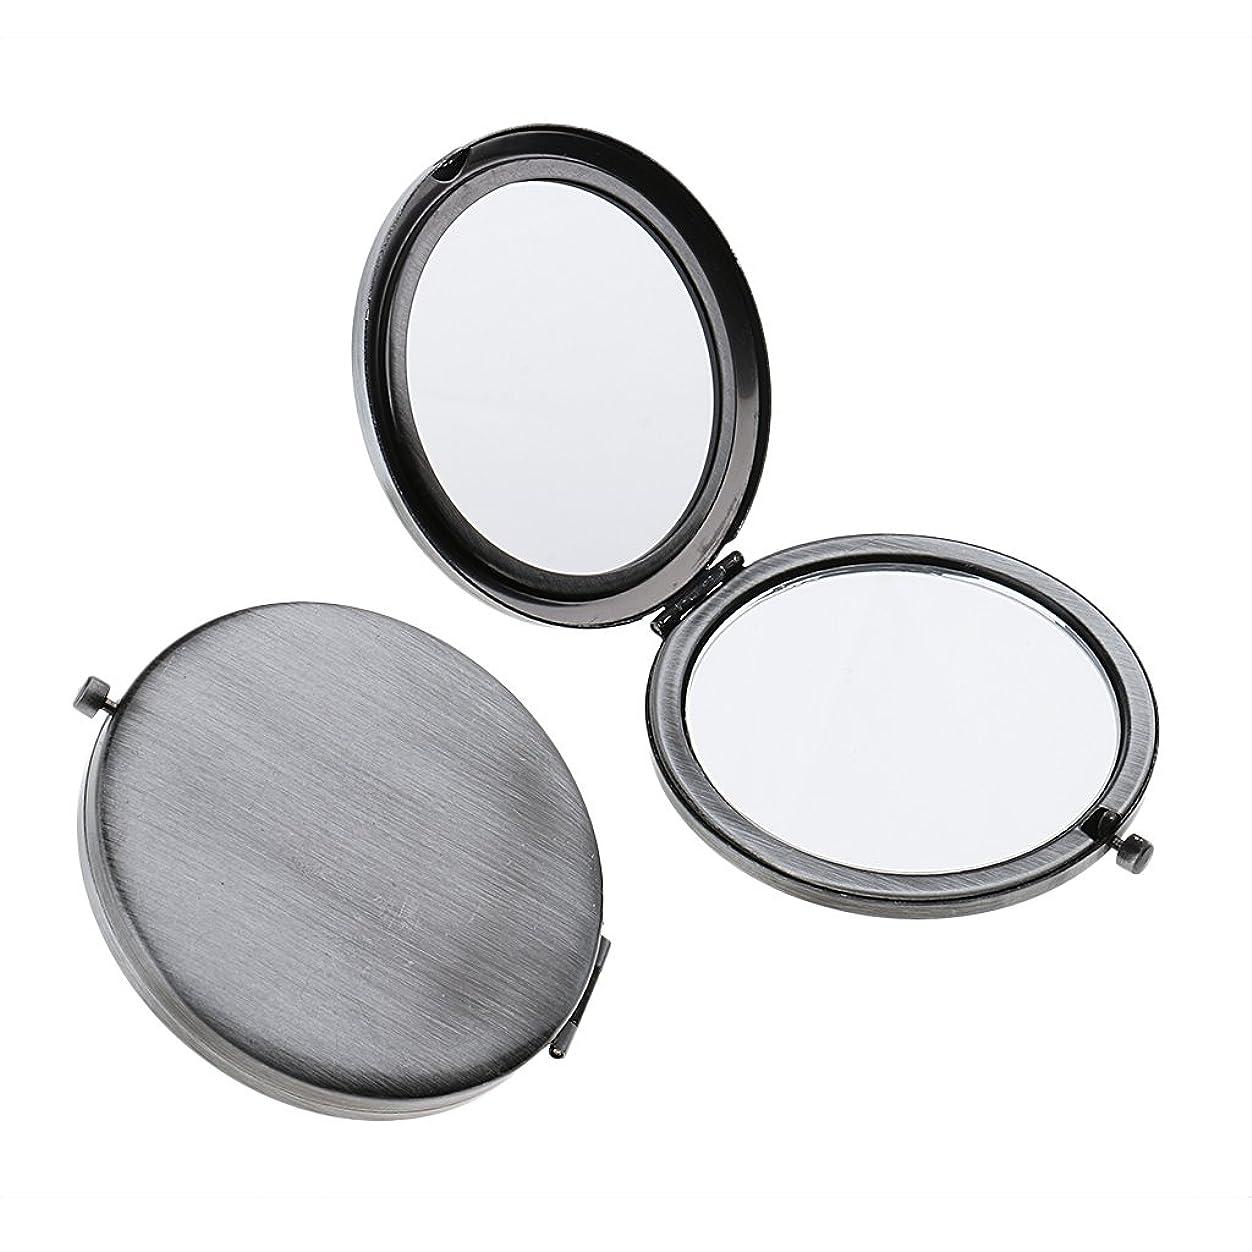 T TOOYFUL ミニ手鏡 両面コンパクトミラー ステンレス 折りたたみ式 ハンドミラー 携帯ミラー 2個入り - クラシックシルバー